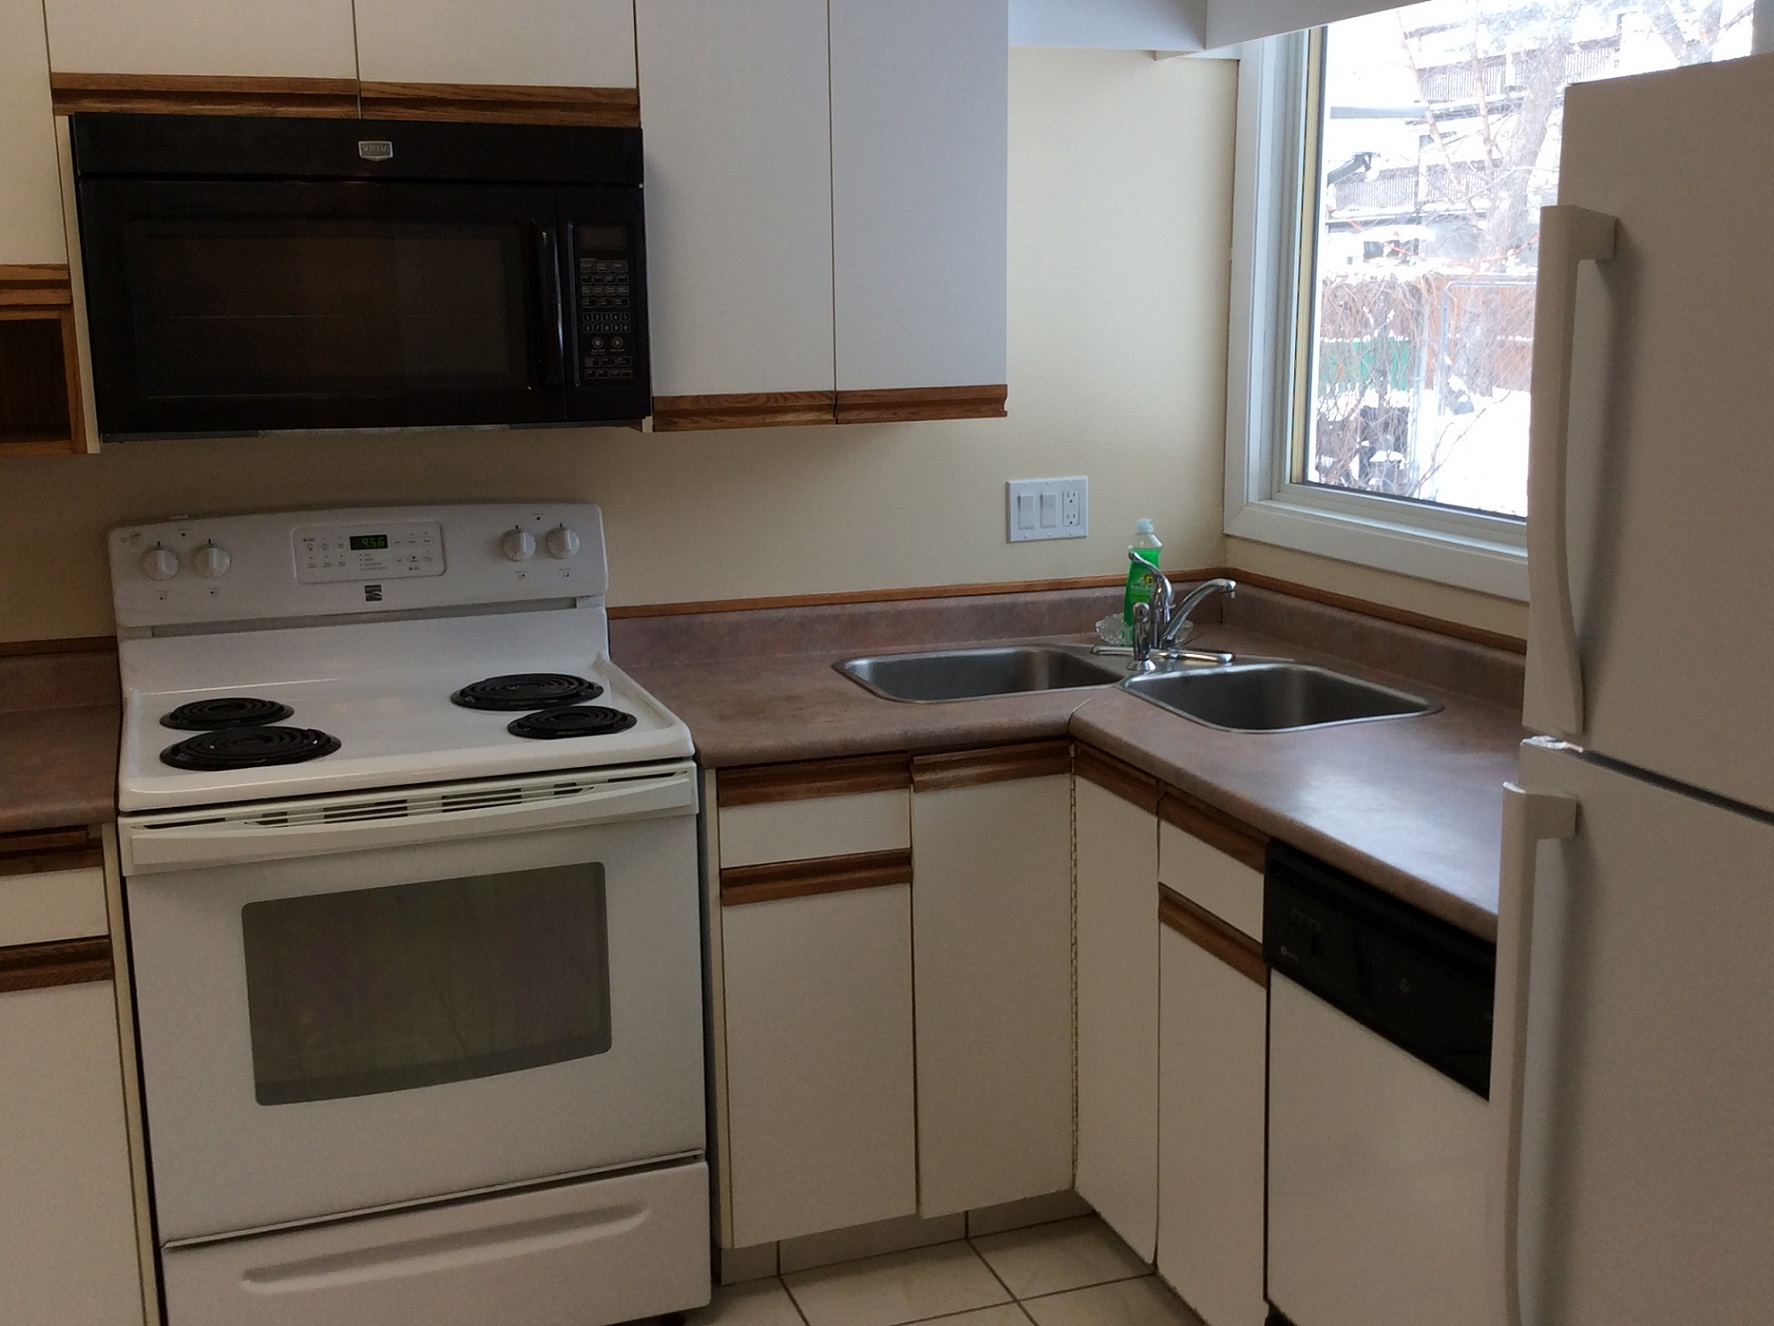 119 Thatcher Dr.,Winnipeg,Manitoba,3 Bedrooms Bedrooms,3 BathroomsBathrooms,House,Thatcher Dr.,1122